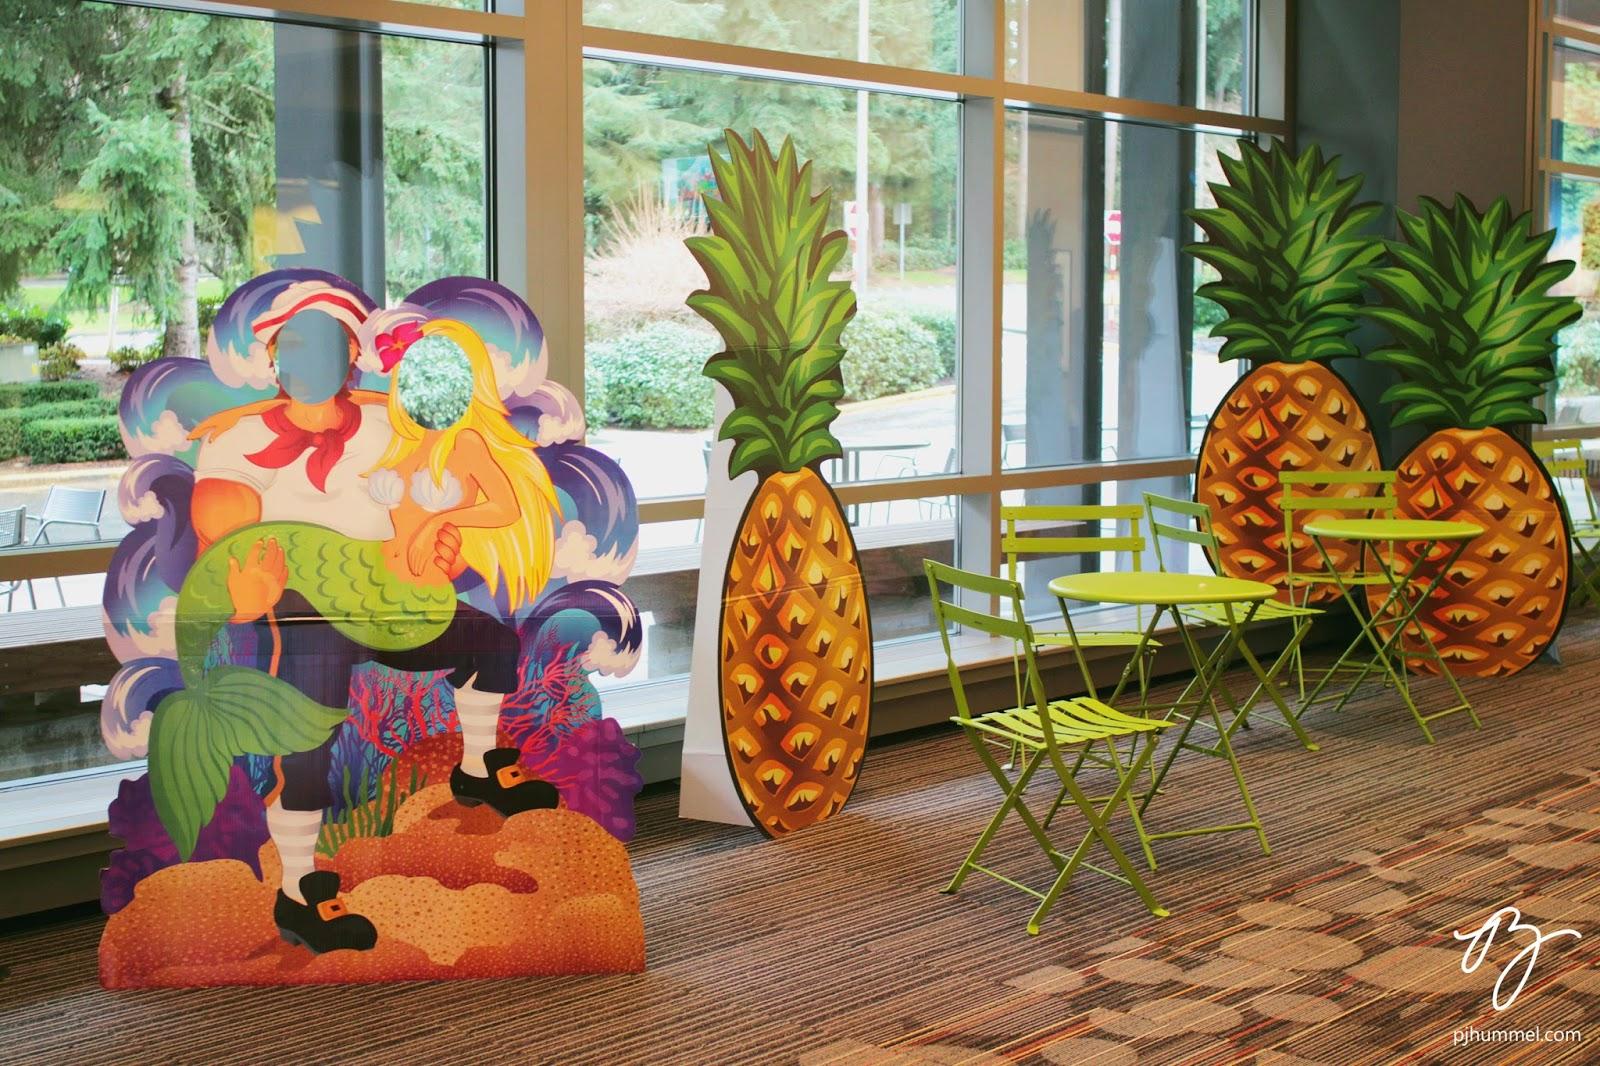 pj hummel and company inc a tropical holiday